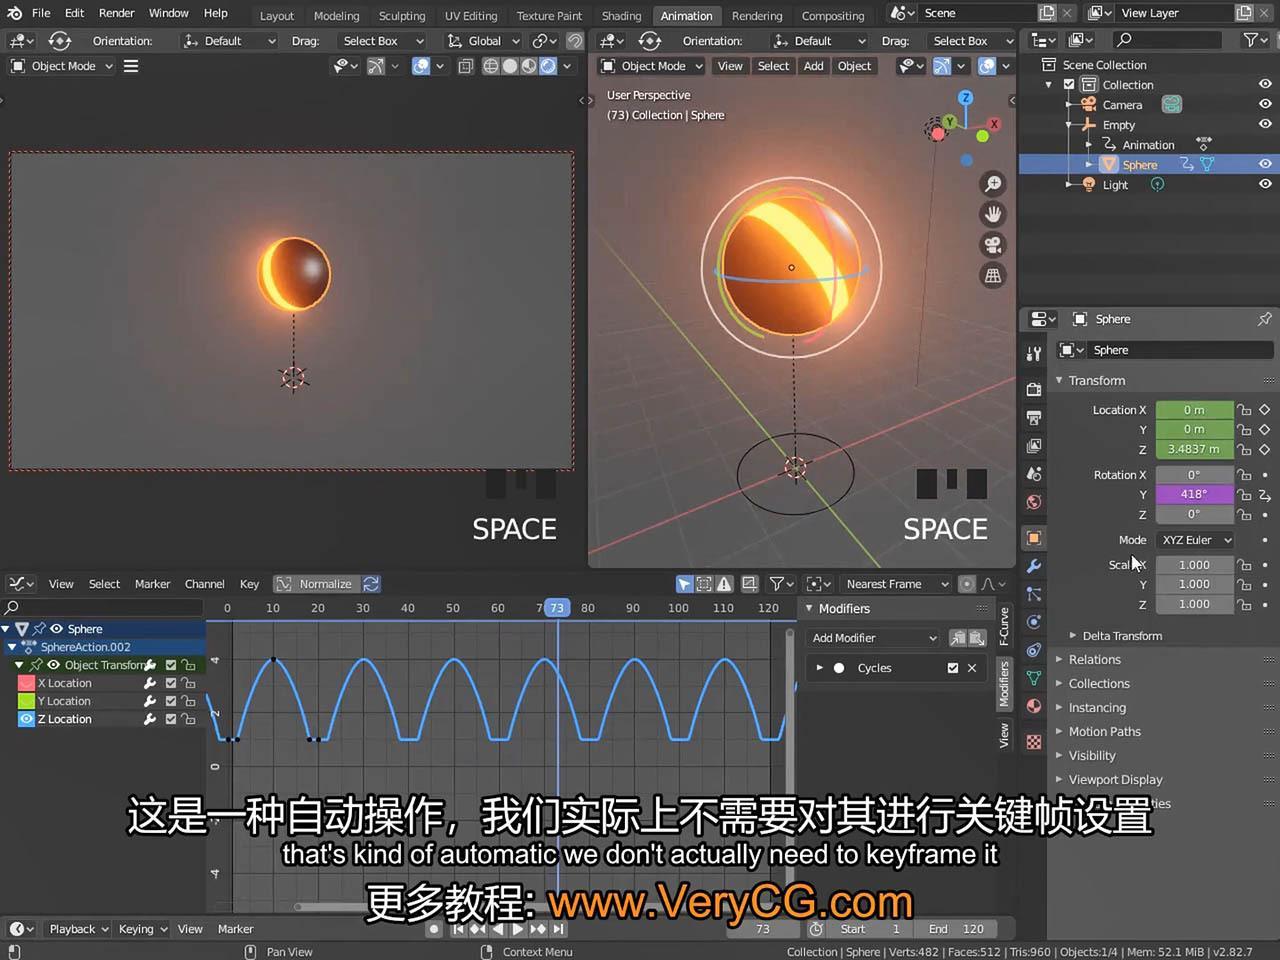 战斗机飞行特效场景教程 CGFastTrack - Blender Animation Fundamentals